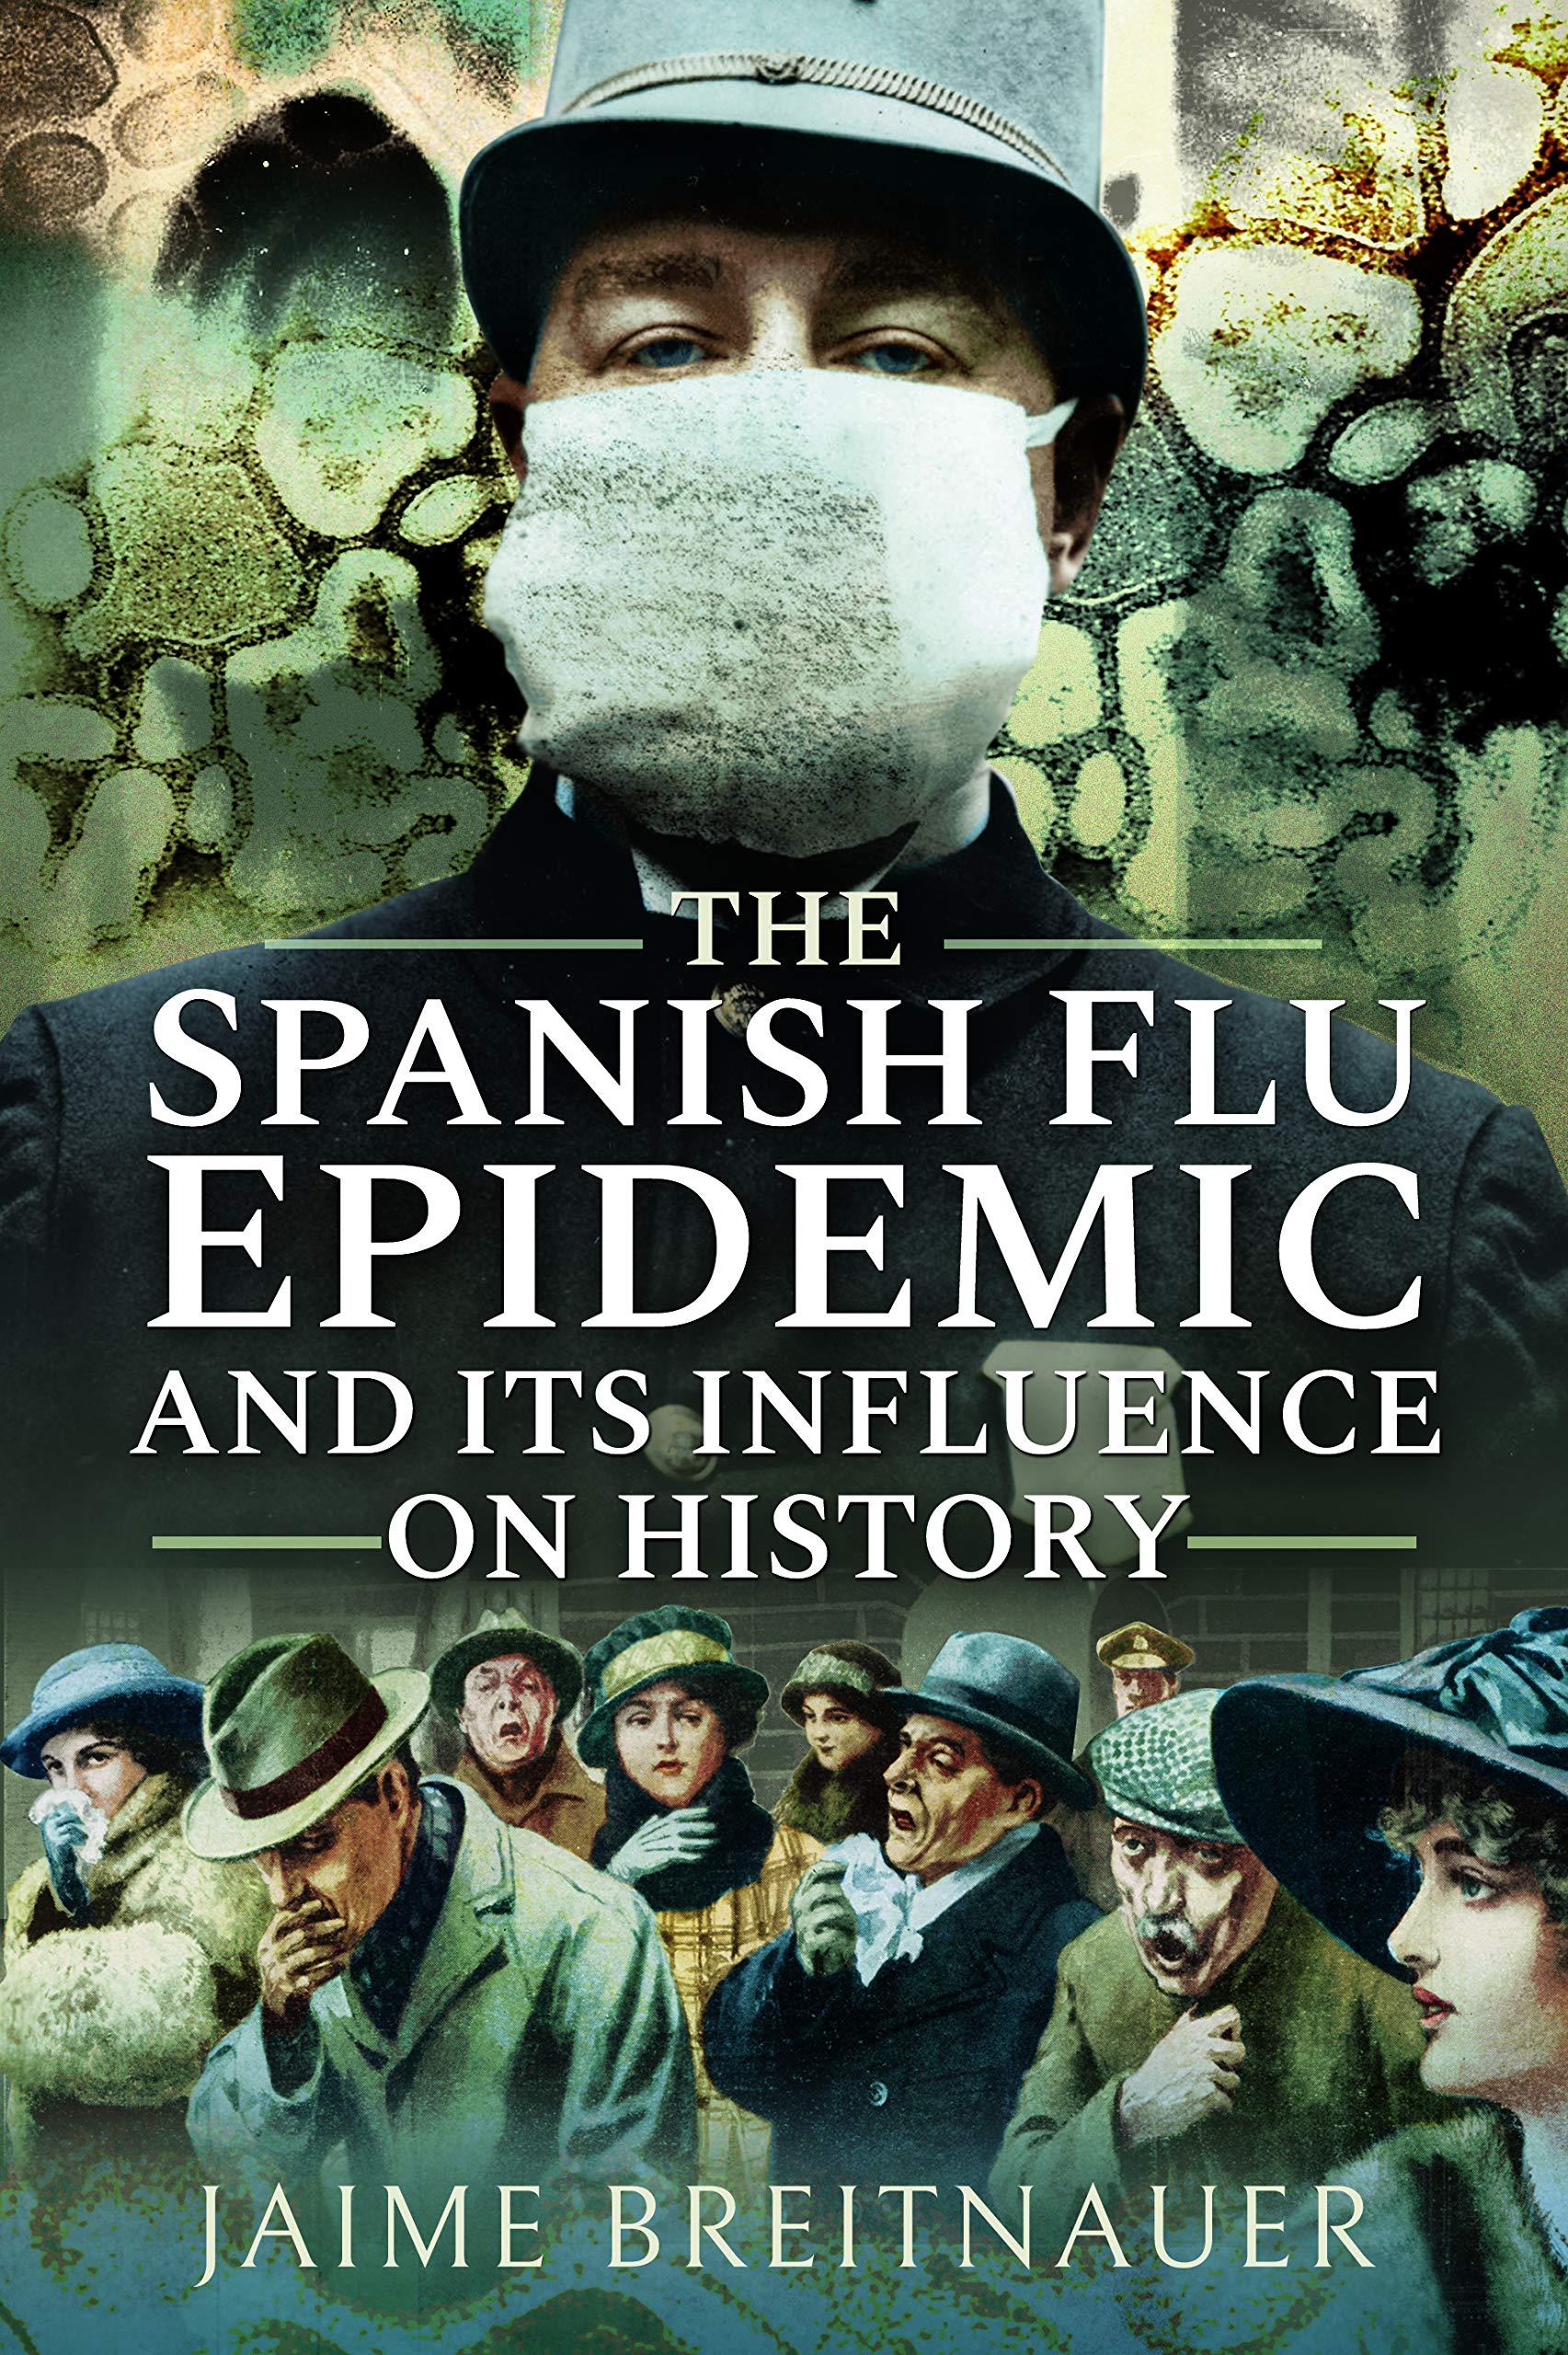 The Spanish Flu Epidemic And Its Influence On History Breitnauer Jaime 9781526745170 Amazon Com Books